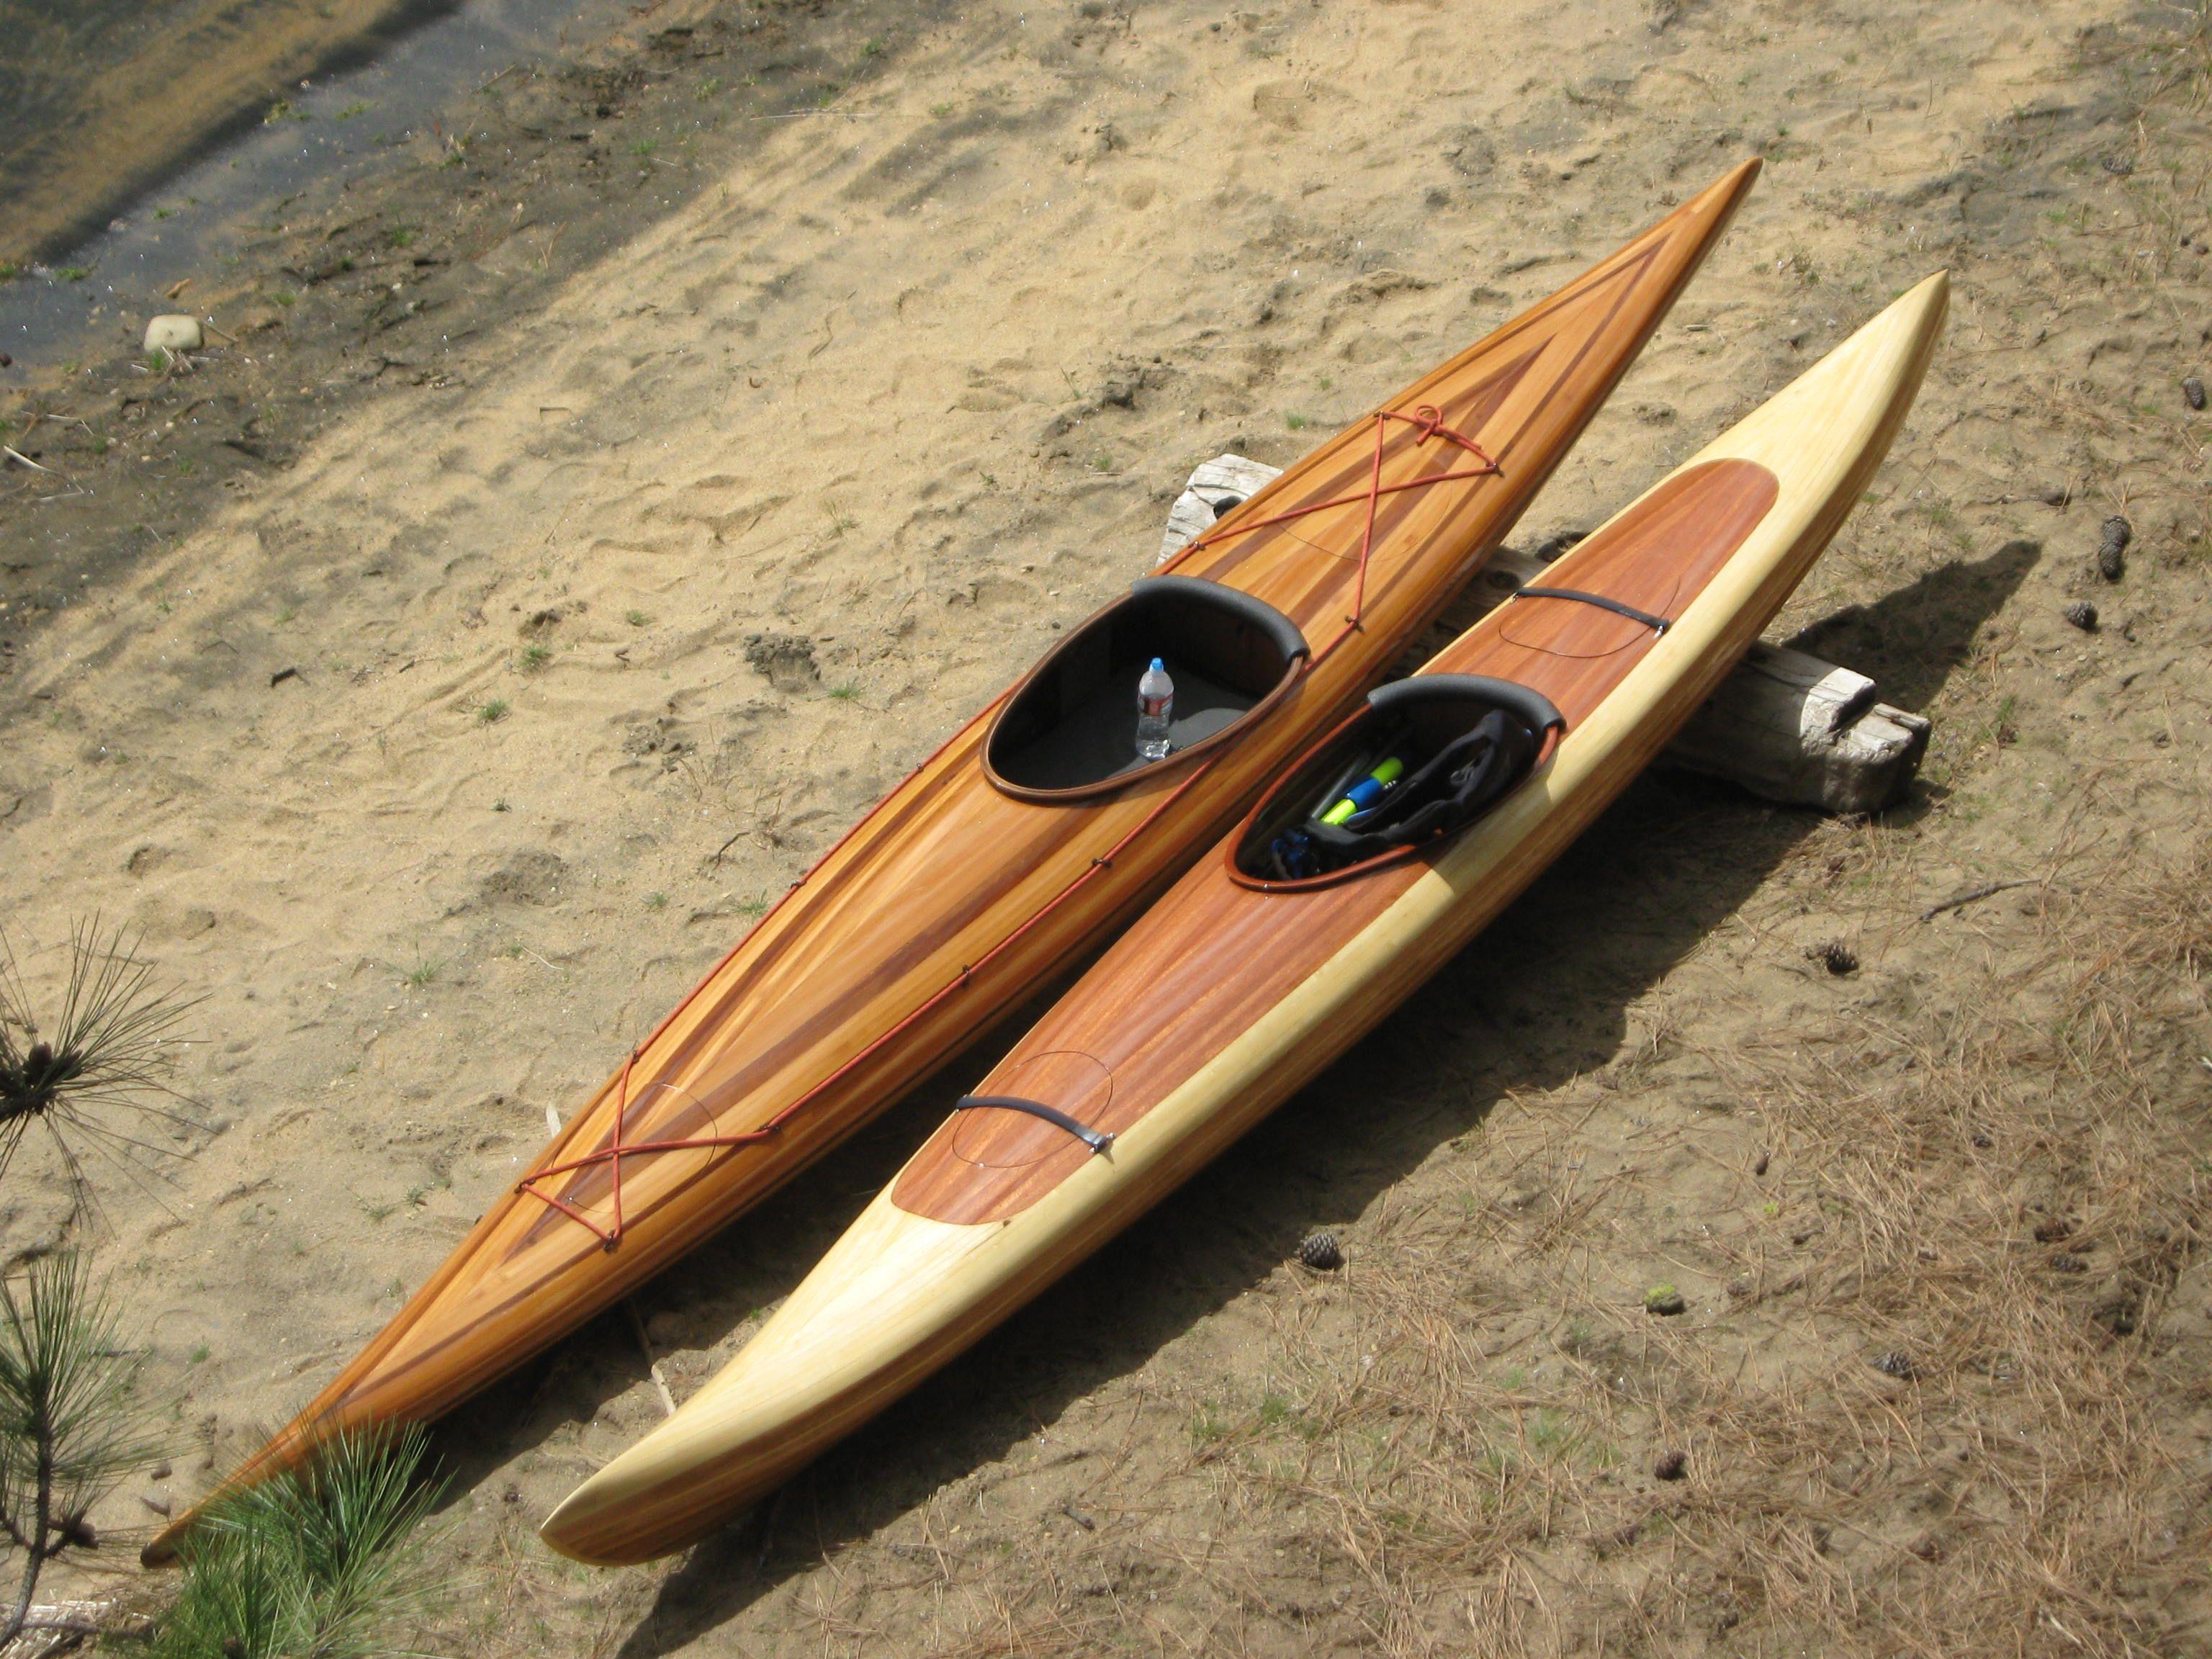 Agree, Cedar strip kayak cost really